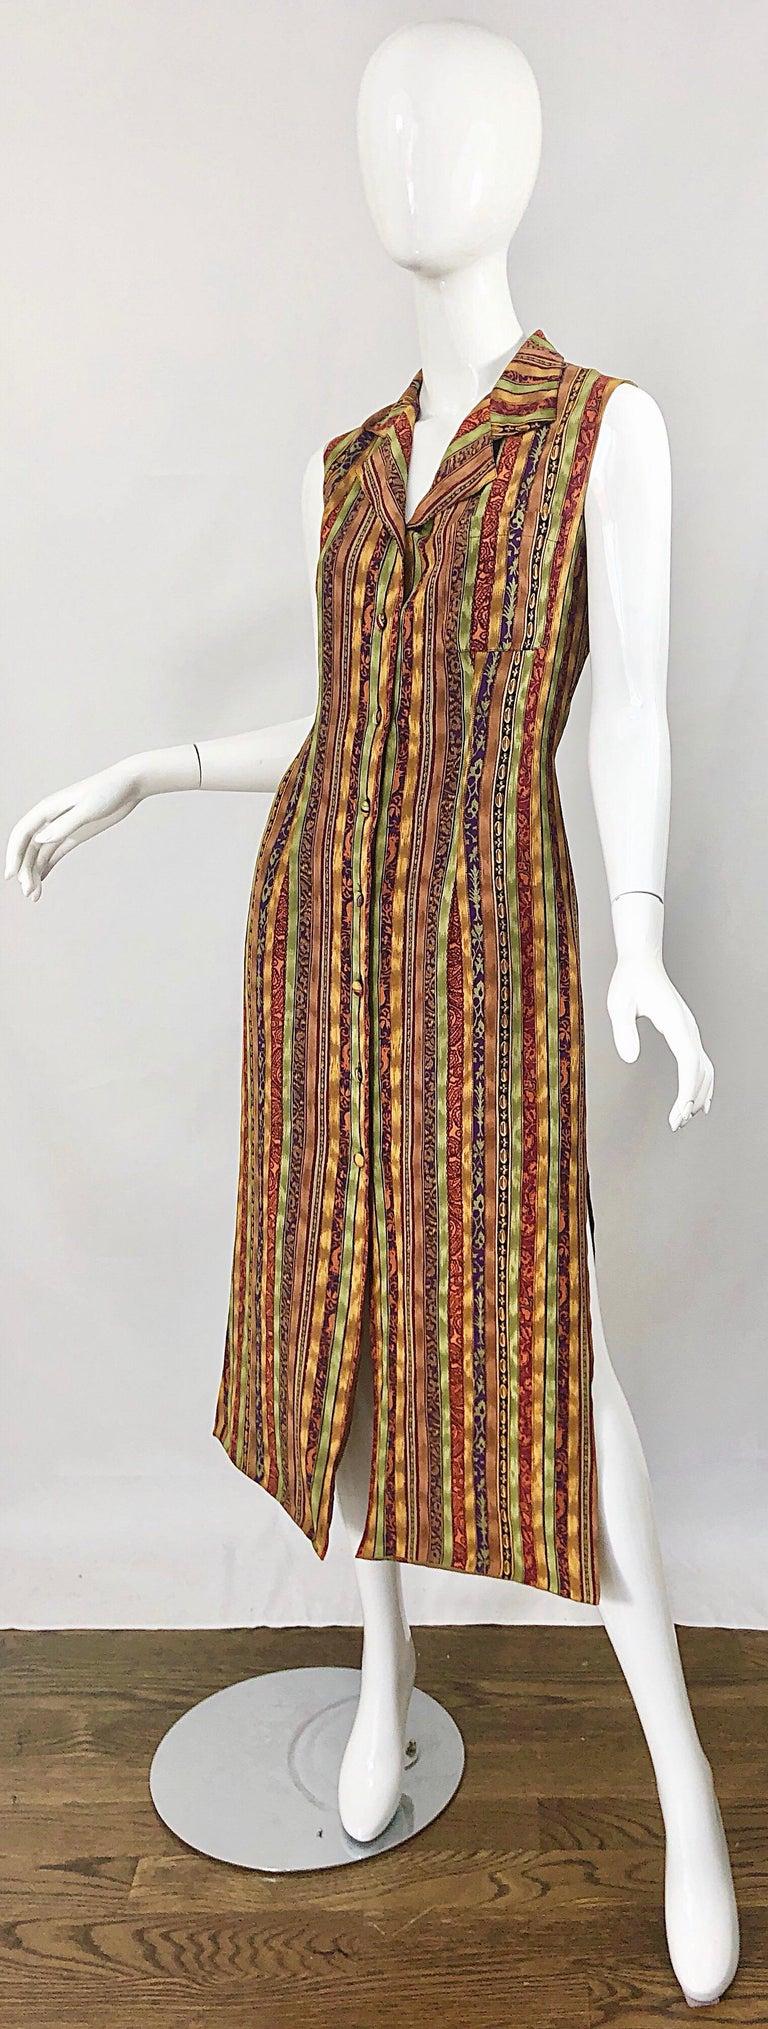 1990s Boho Silk Warm Color Vertical Aztec Stripe Sleeveless 90s Midi Shirt Dress For Sale 8